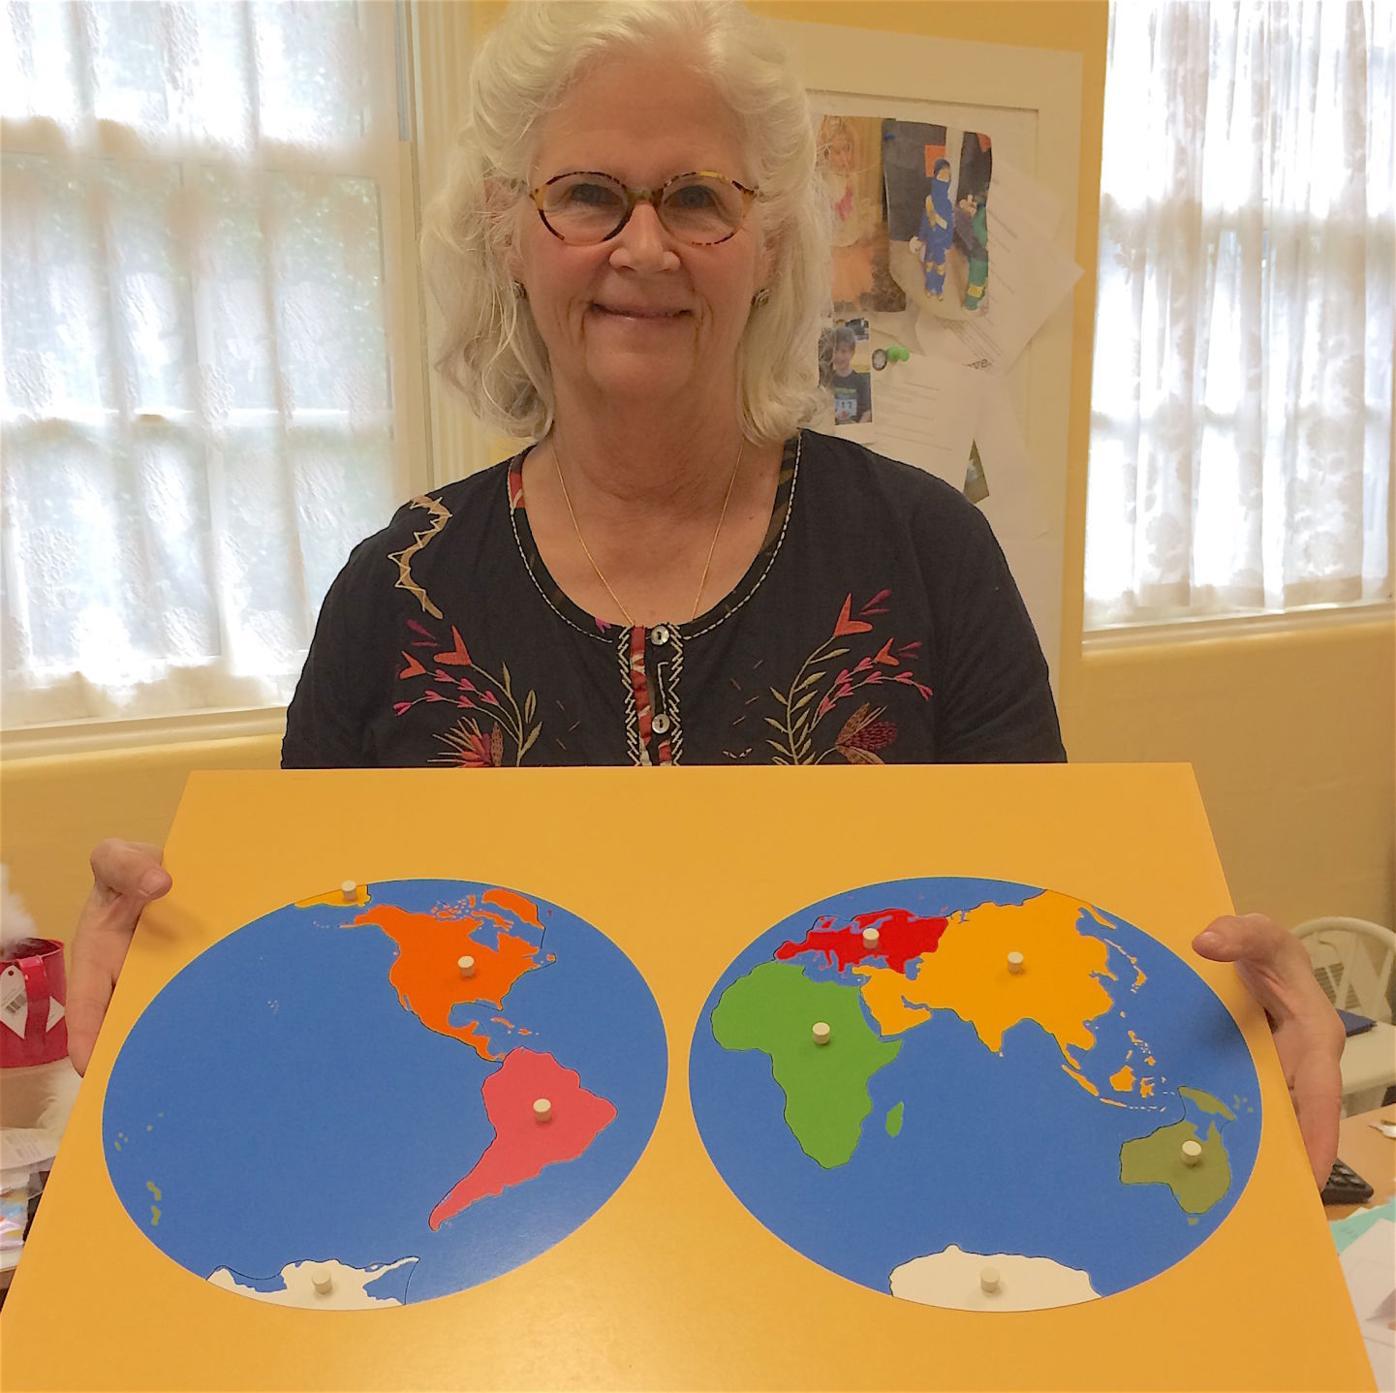 Christ Church Day School celebrates 60 years, montessori-style